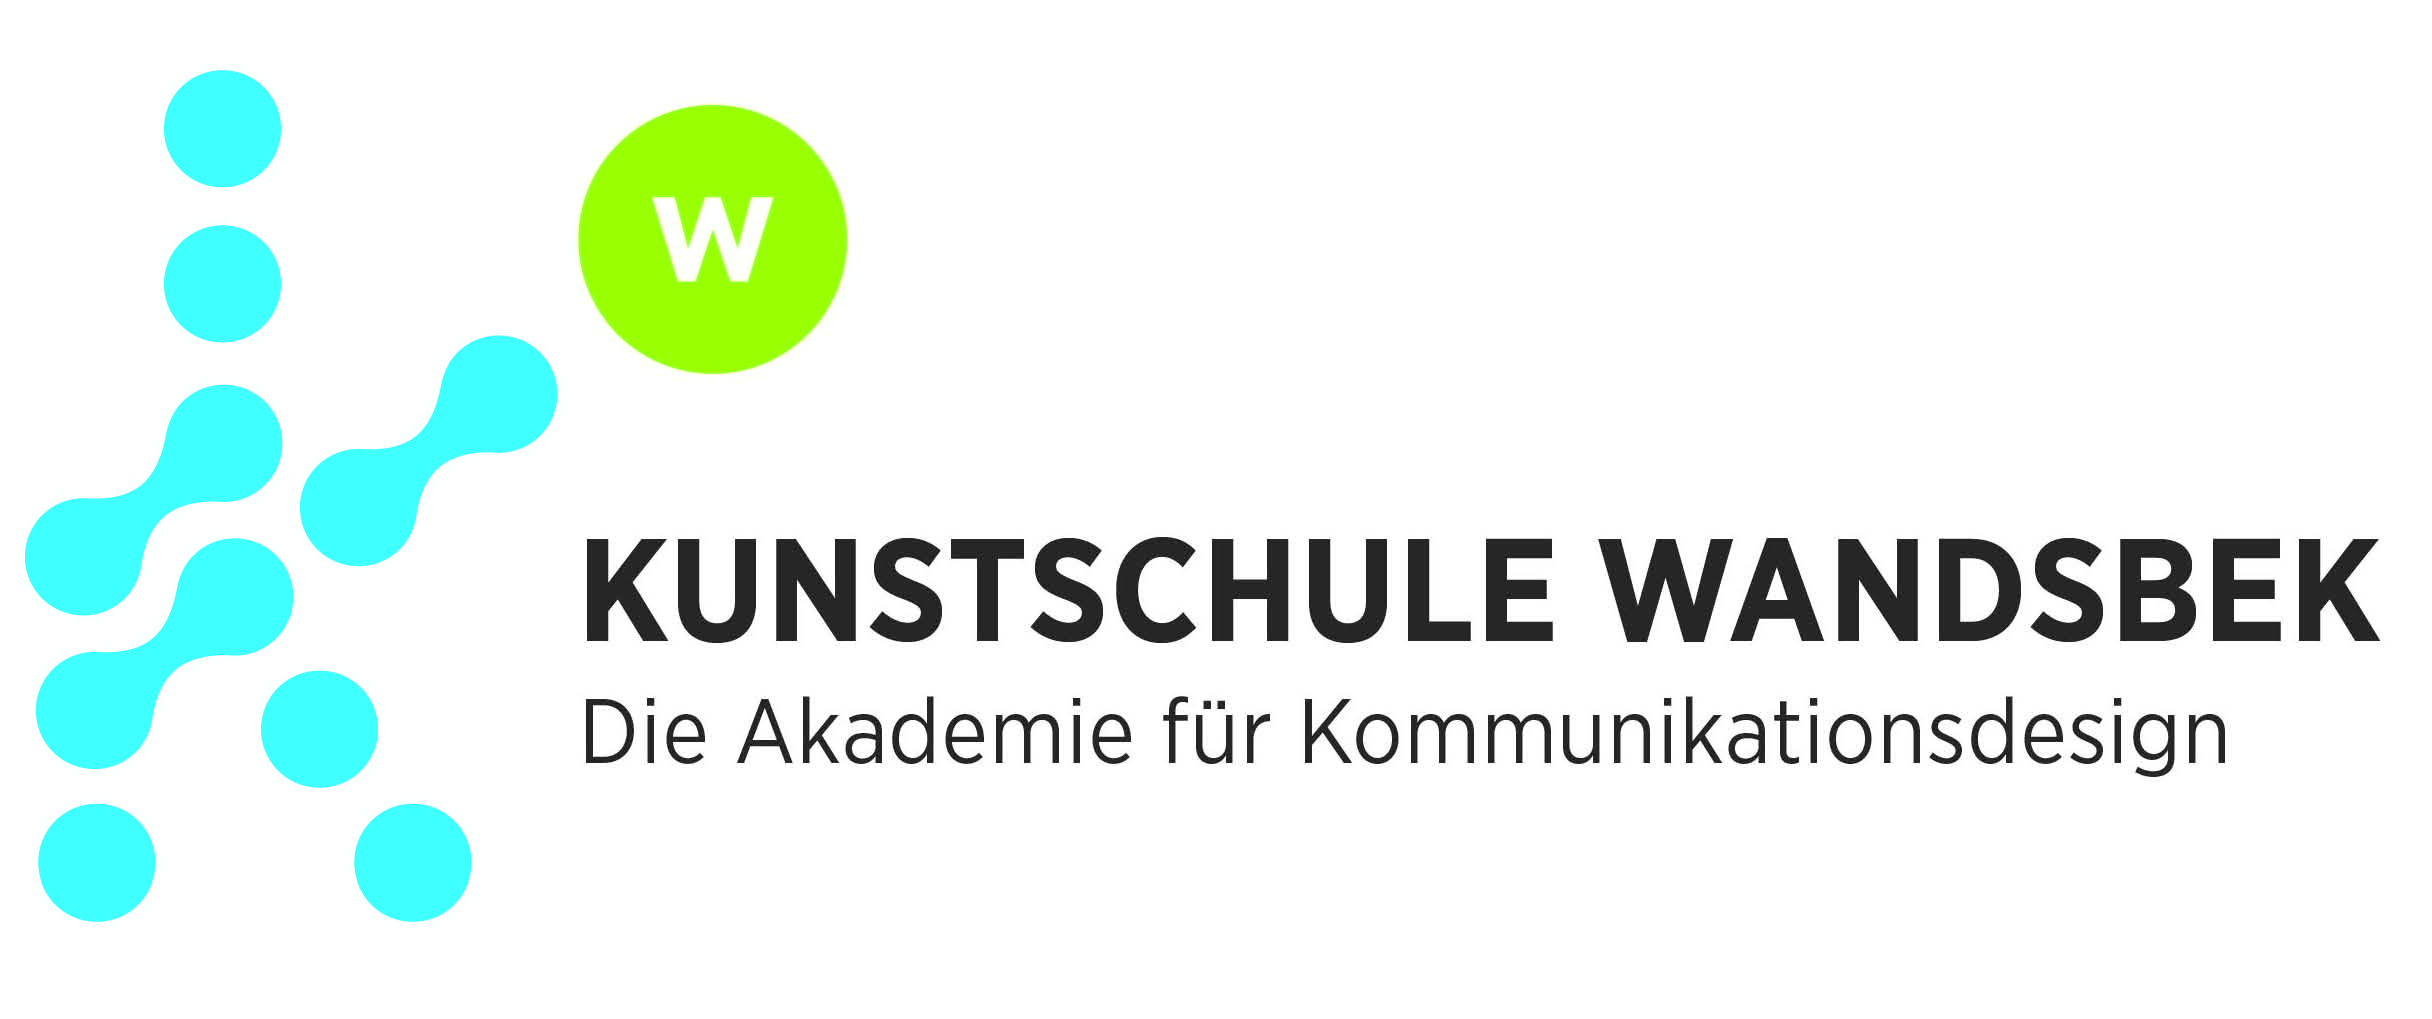 Kunstschule Wandsbek GmbH